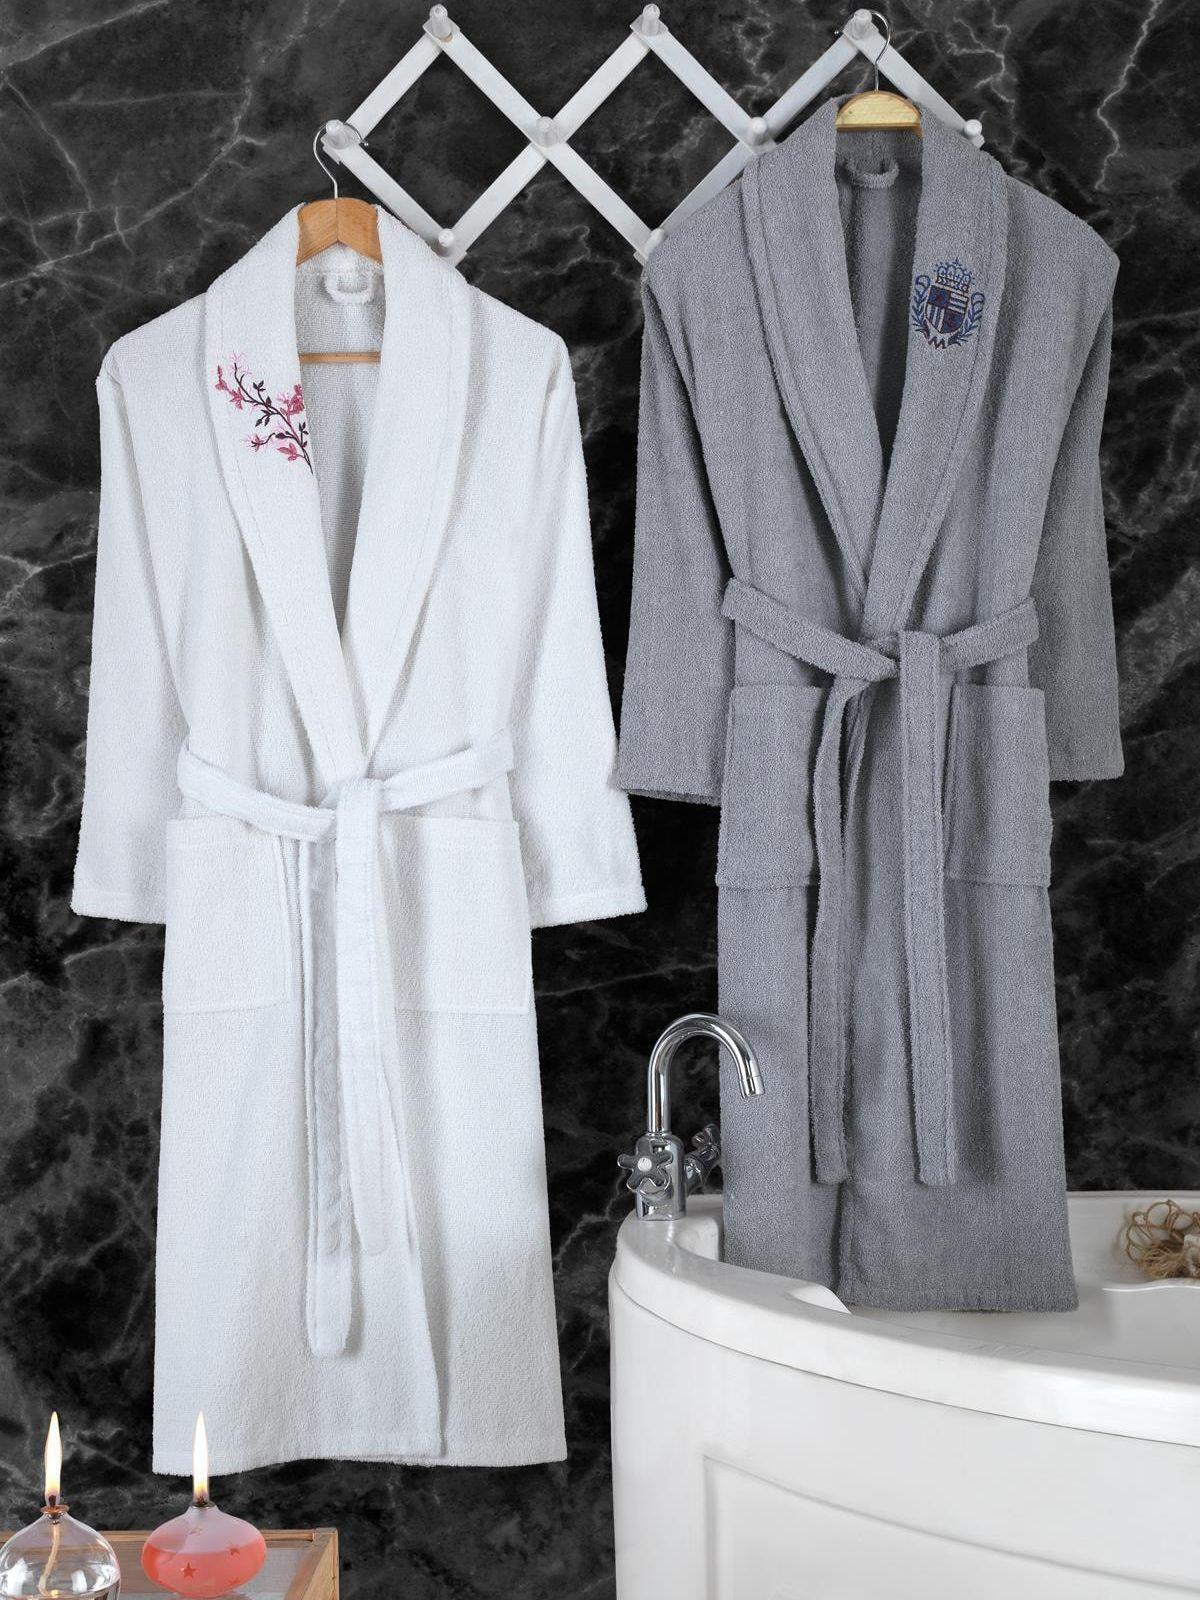 2021 New Bathrobe Set 2 PCs Double Bathrobe Bathroom Pajamas Home Garment Bathroom Accessories Slim And Absorbent 100% Cotton